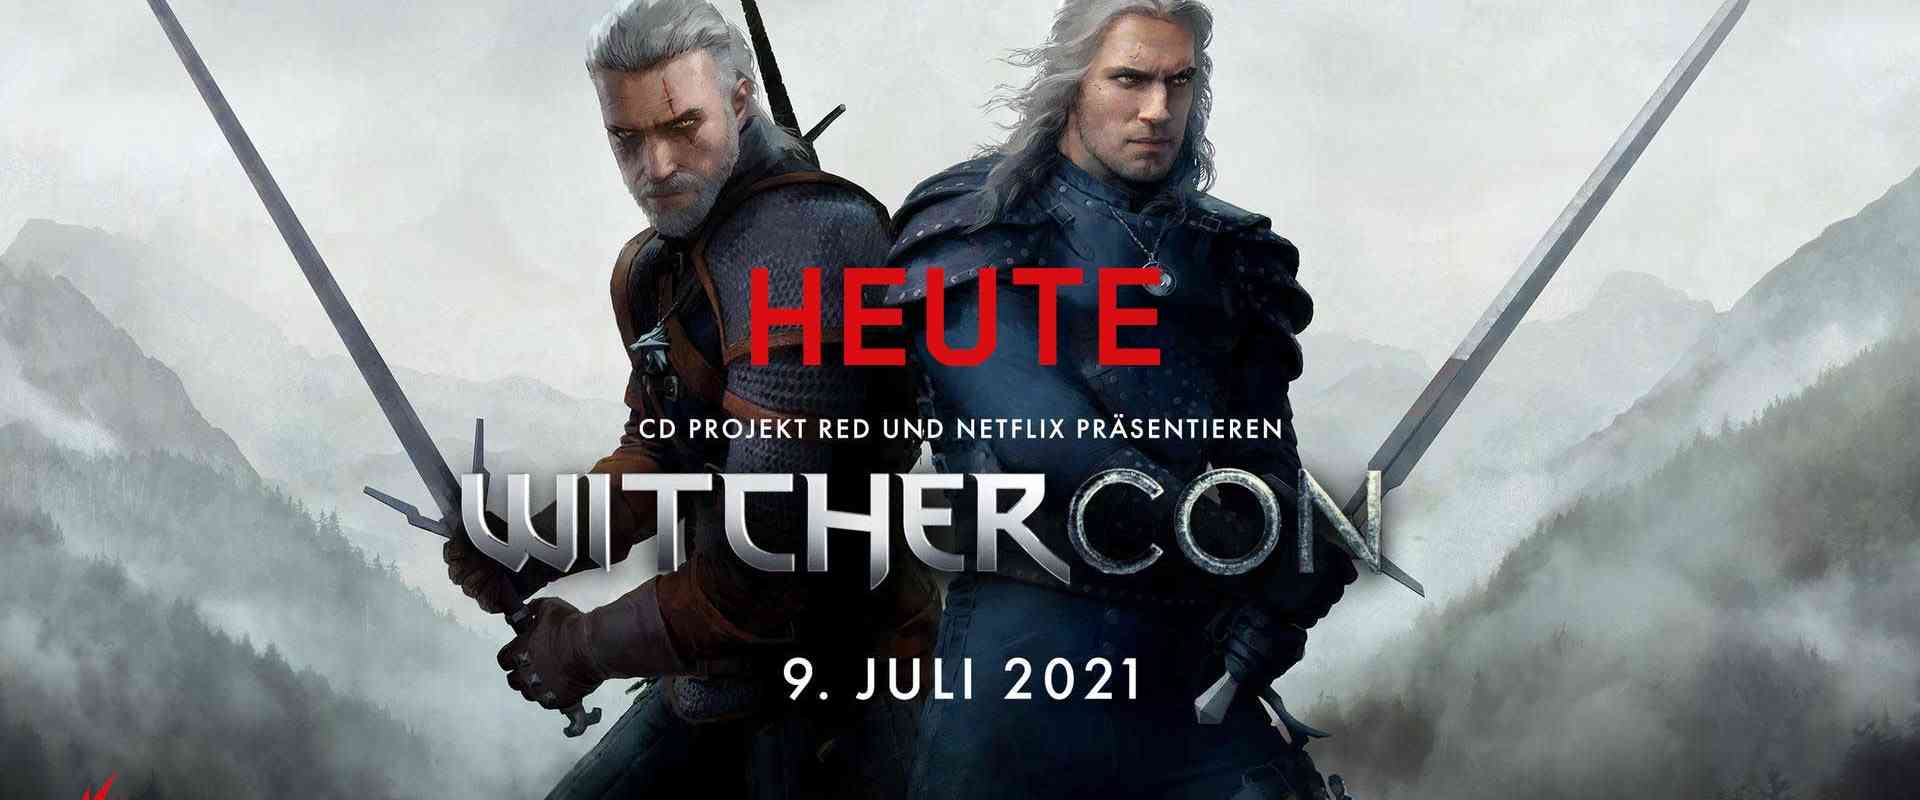 witchercon jul 2021 heute